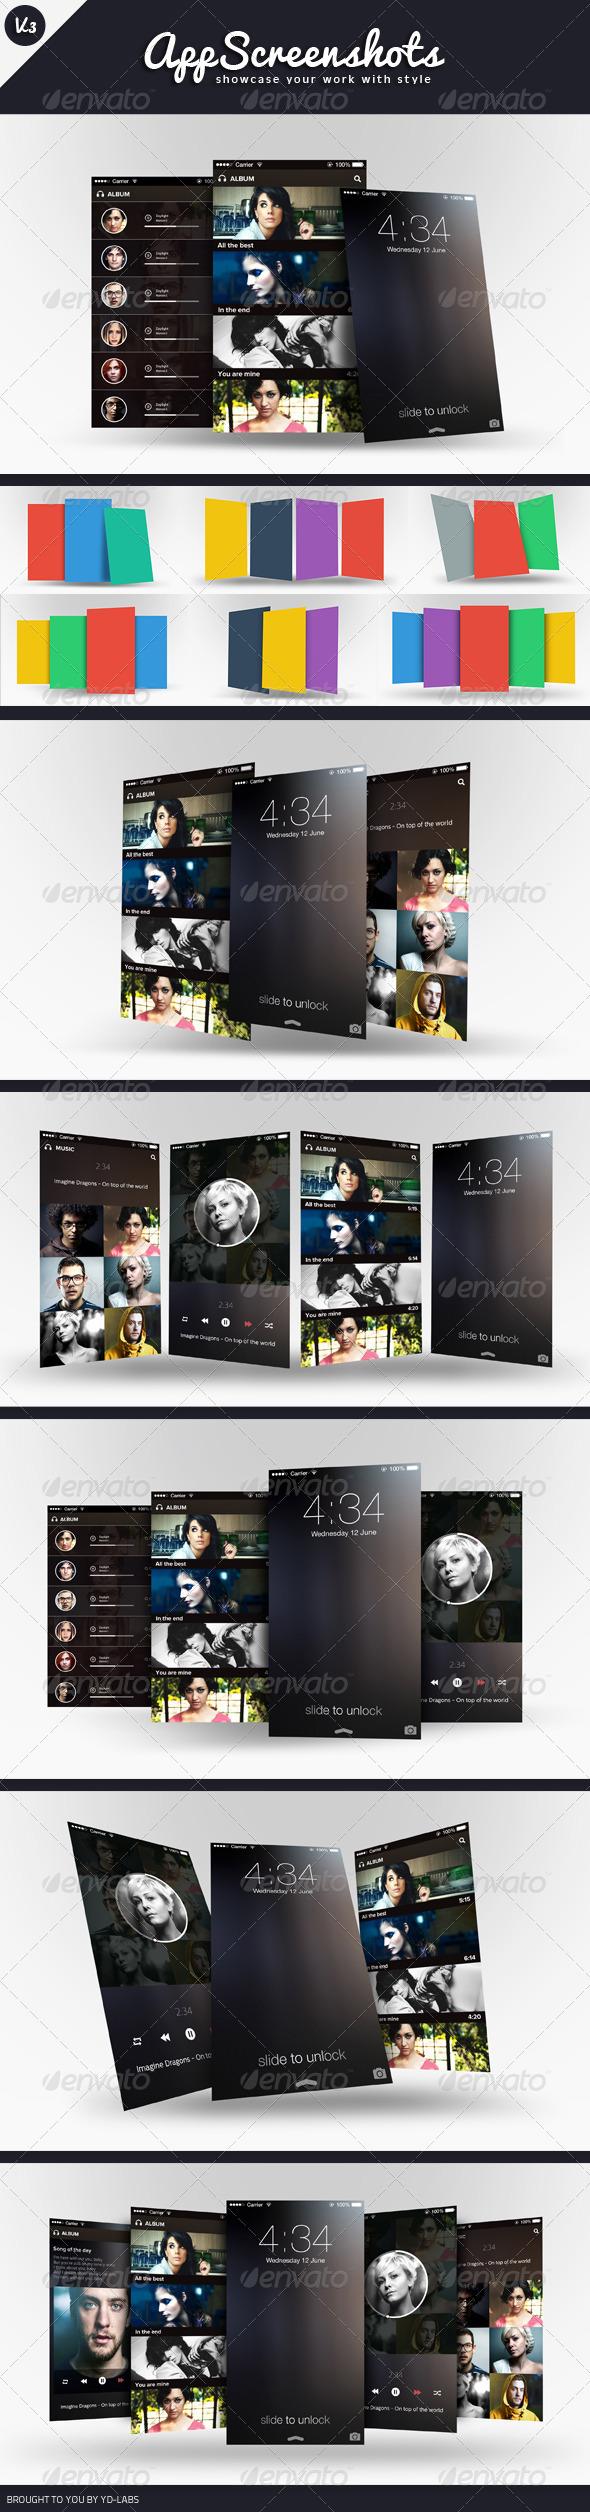 GraphicRiver App Screenshot Mockups V3 5663062